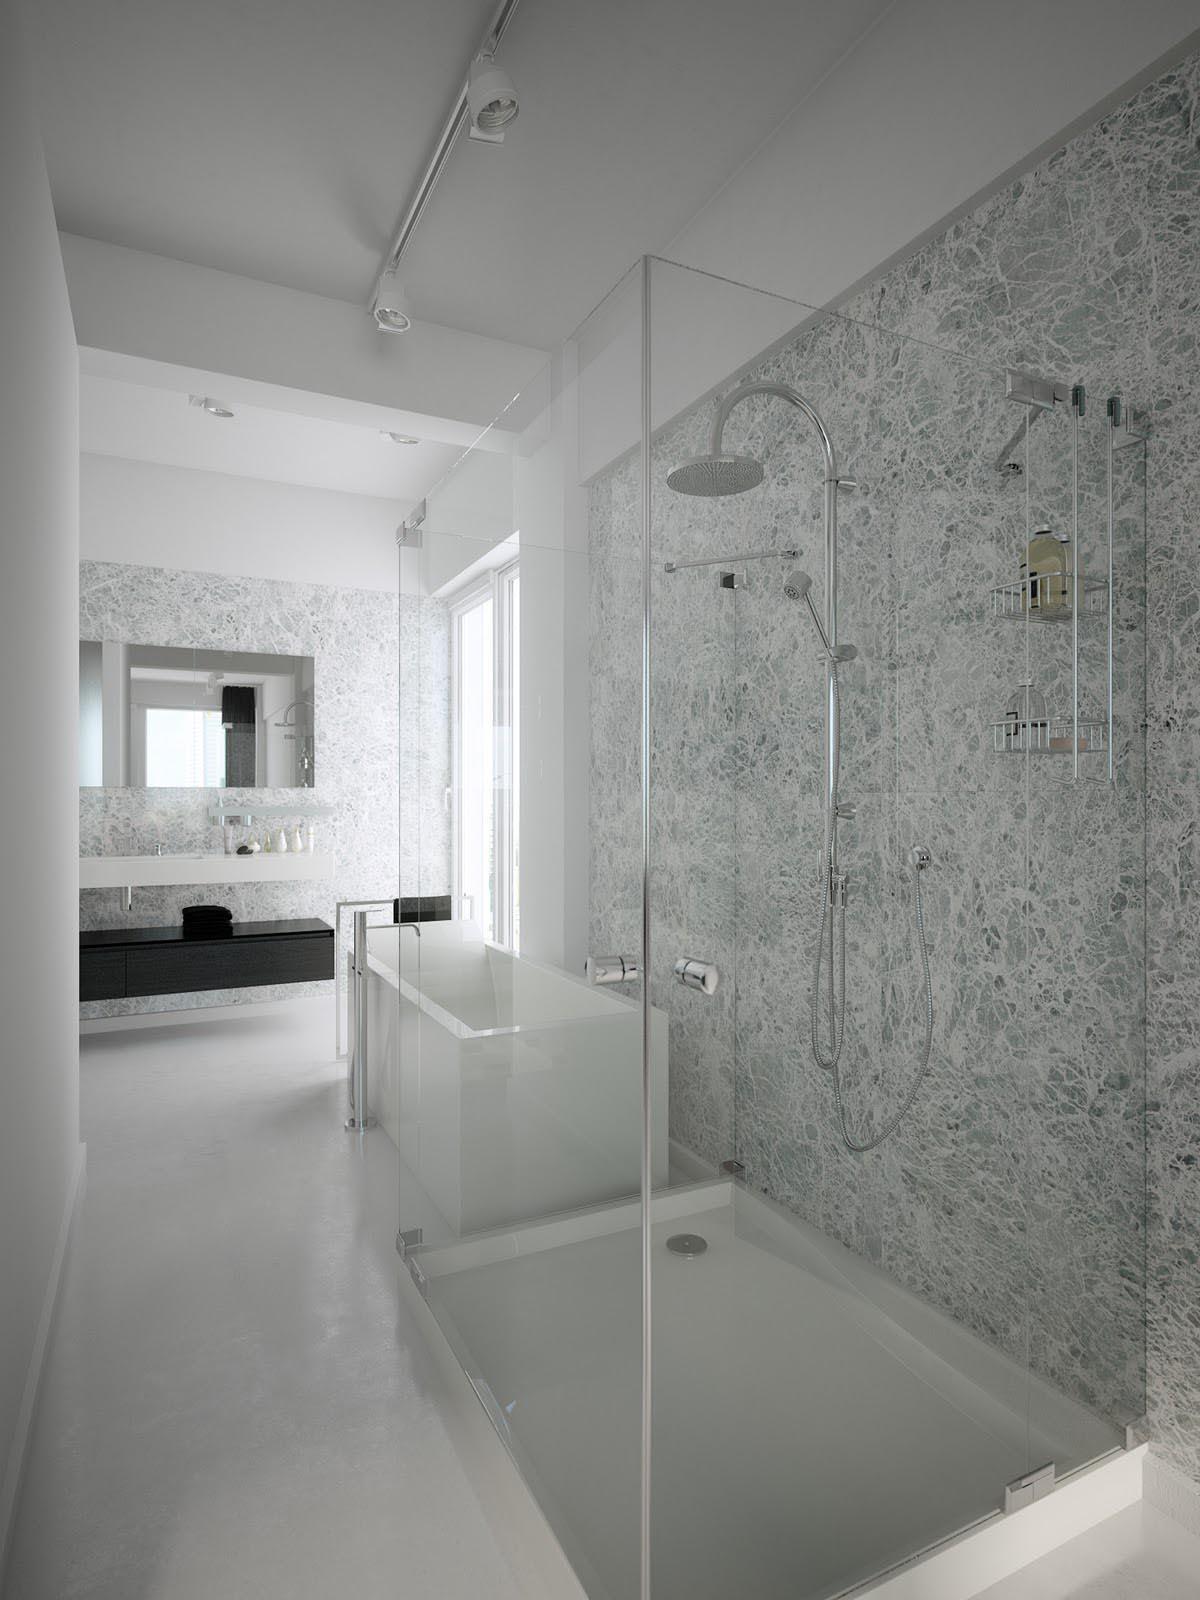 Unsere echtglasduschen durchblick nach ma bulling for Bathroom designs using mariwasa tiles